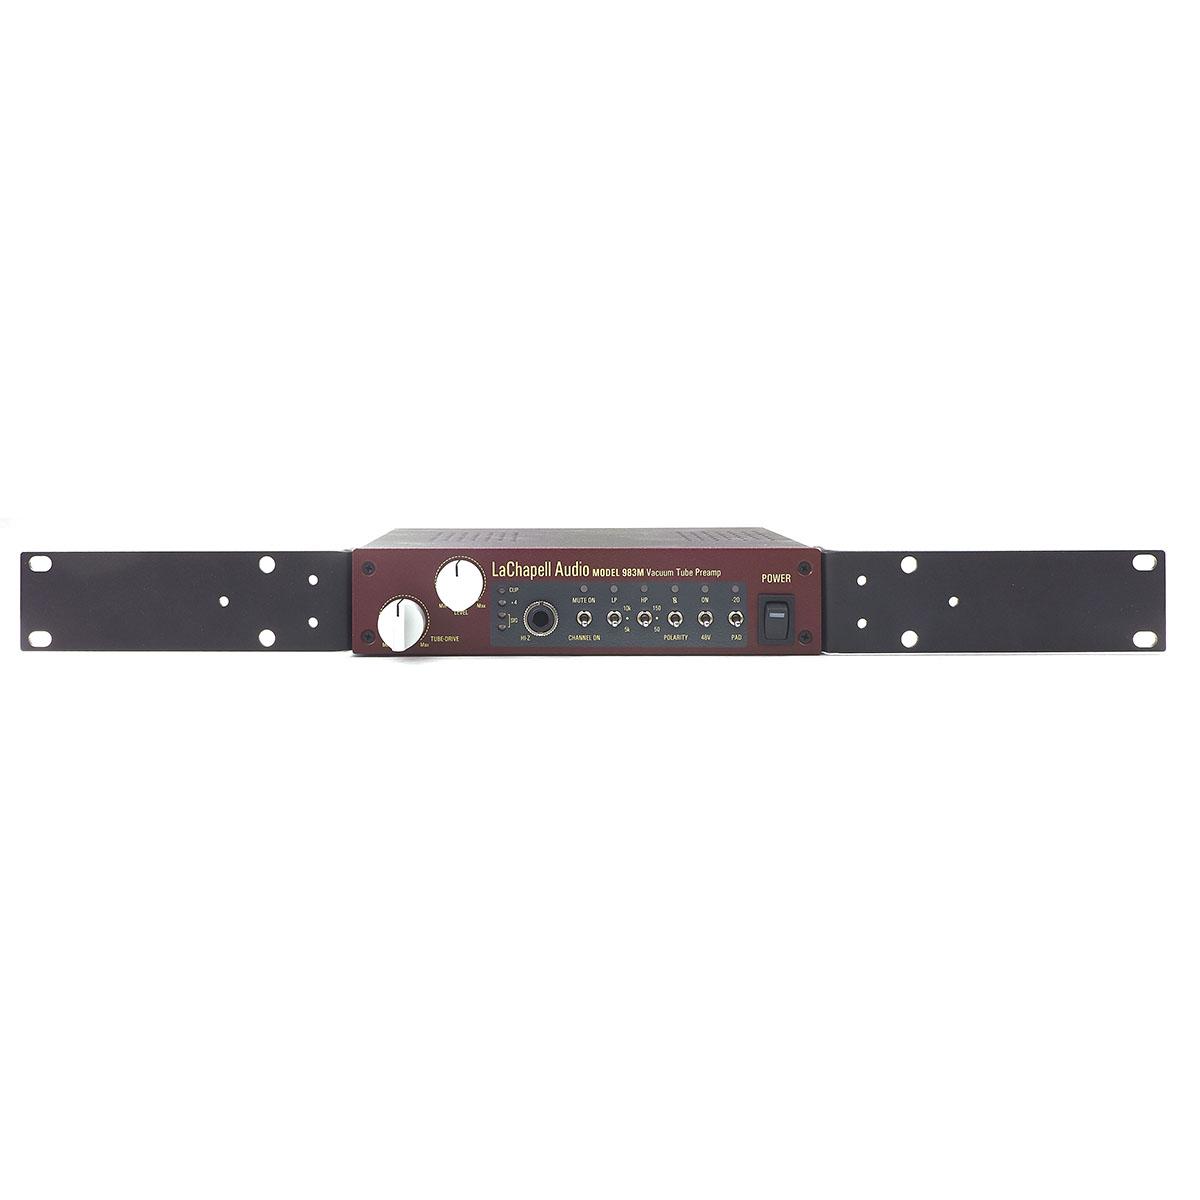 Lachapell Rack Mount Kit For Tube Mic Preamp 983M